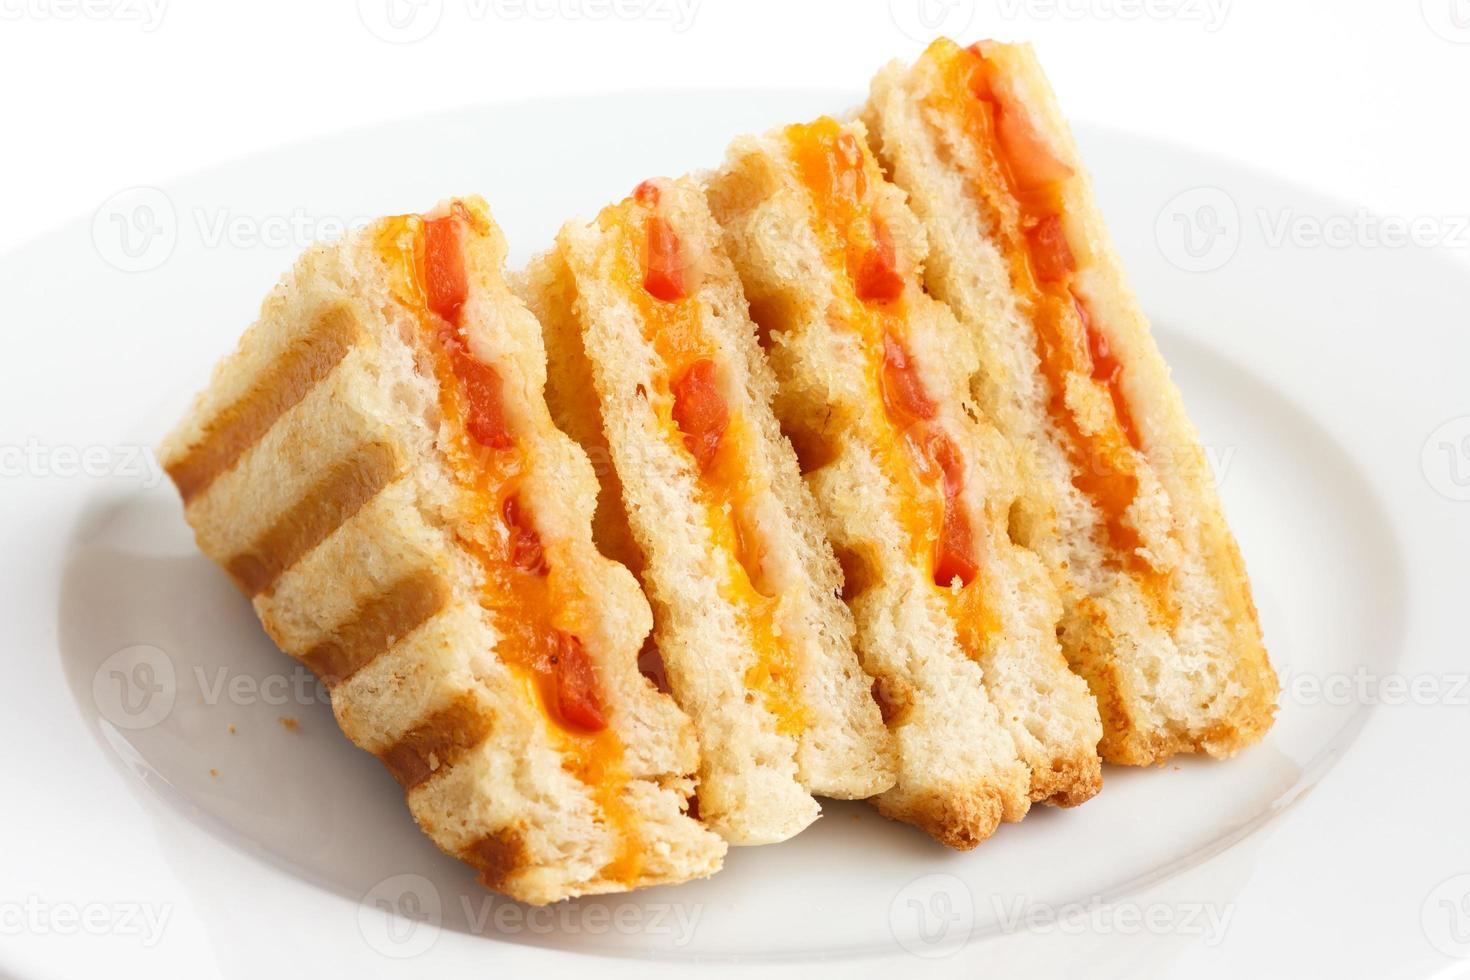 clássico tomate e queijo torrado sanduíche no prato branco. foto